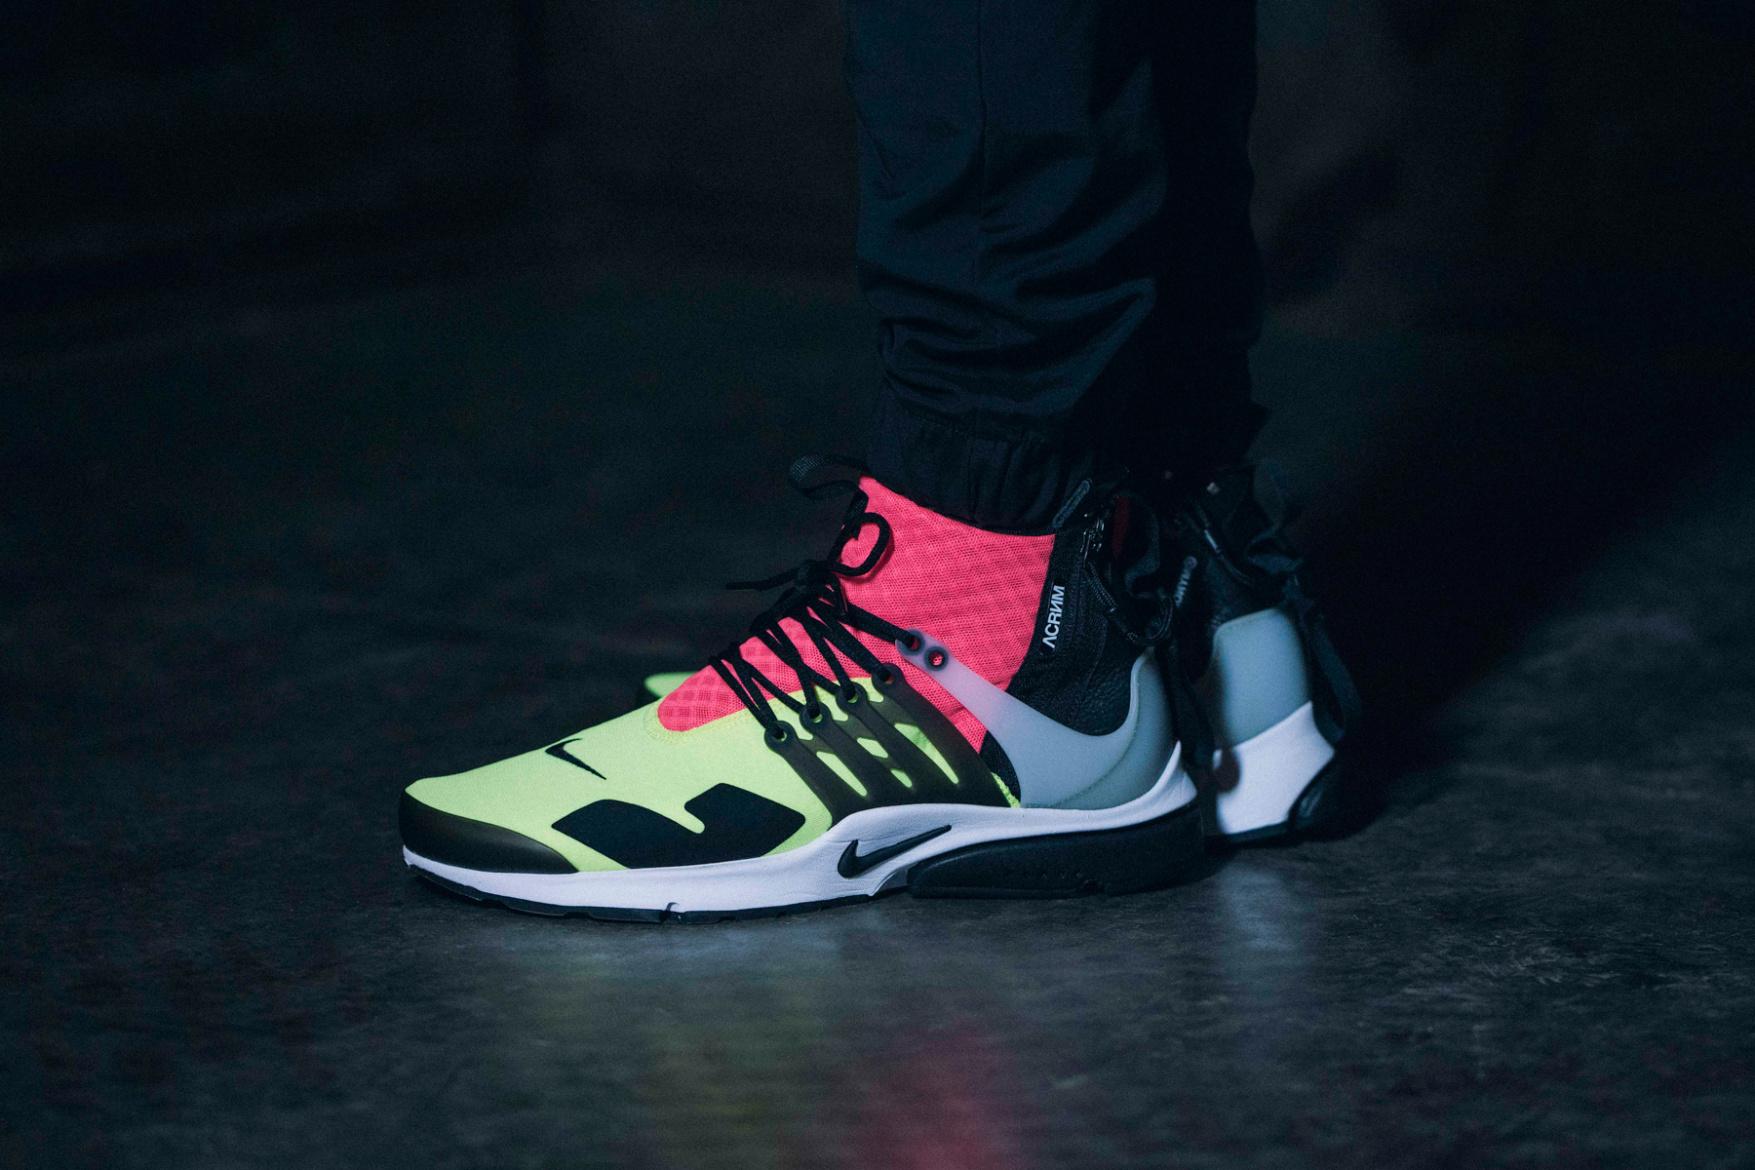 new arrival 2384f 5ca36 ... real acronym nike air presto neon sneakers 2 905a8 e3540